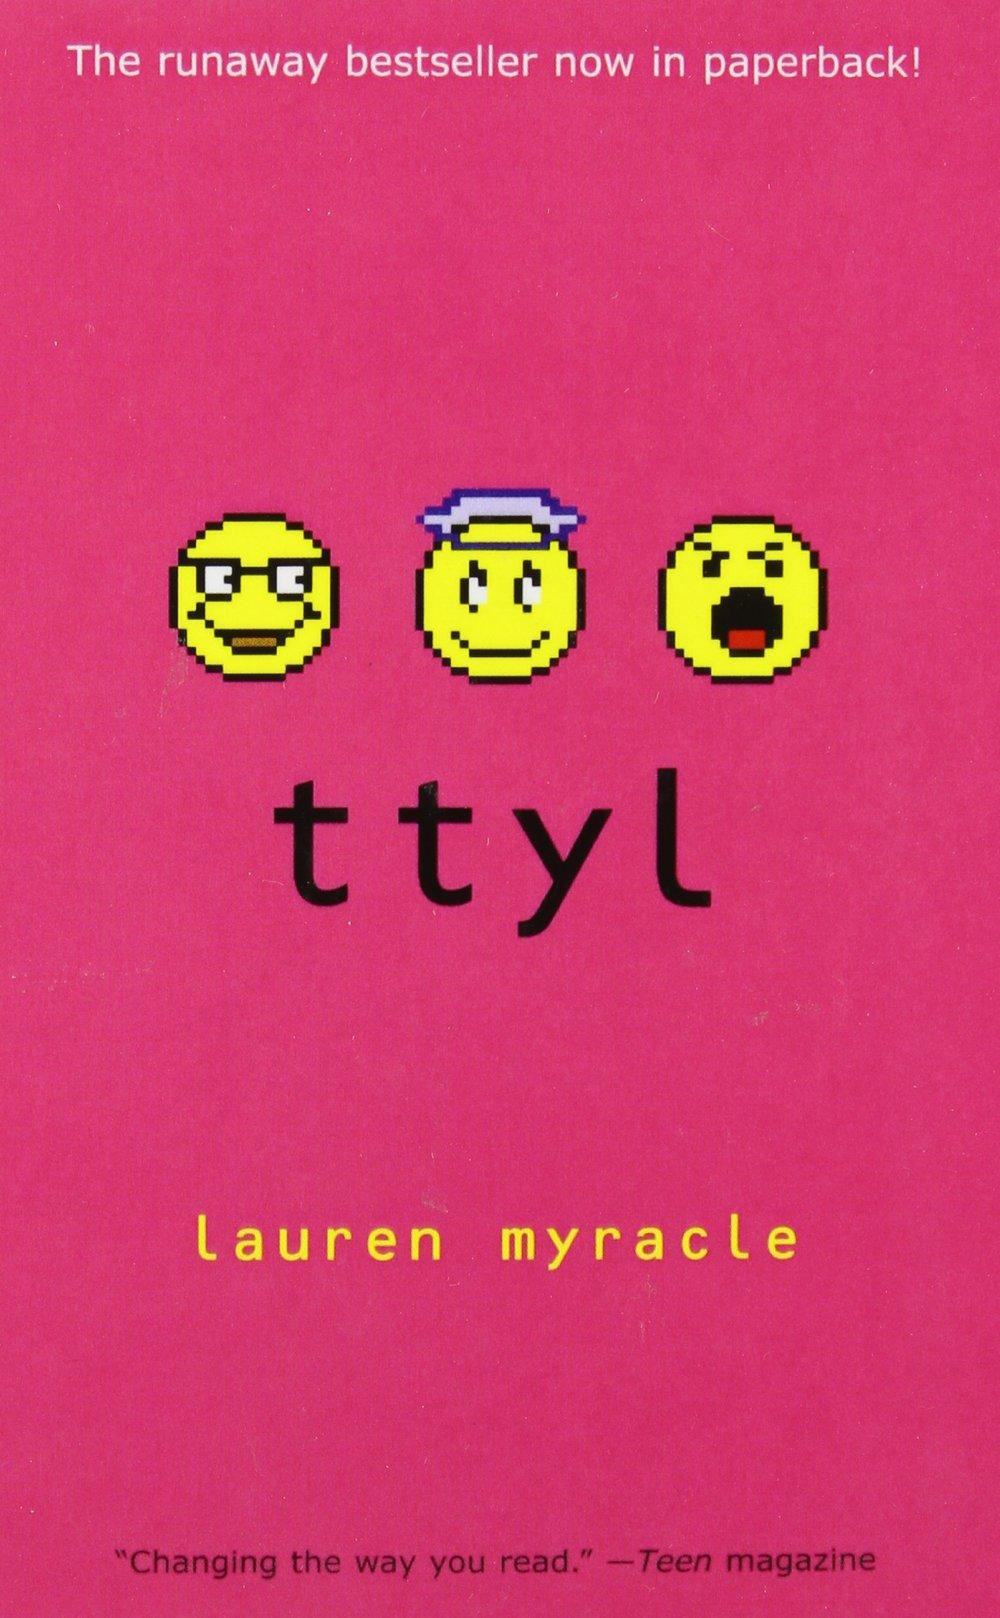 lauren-myracle-ttyl.jpg